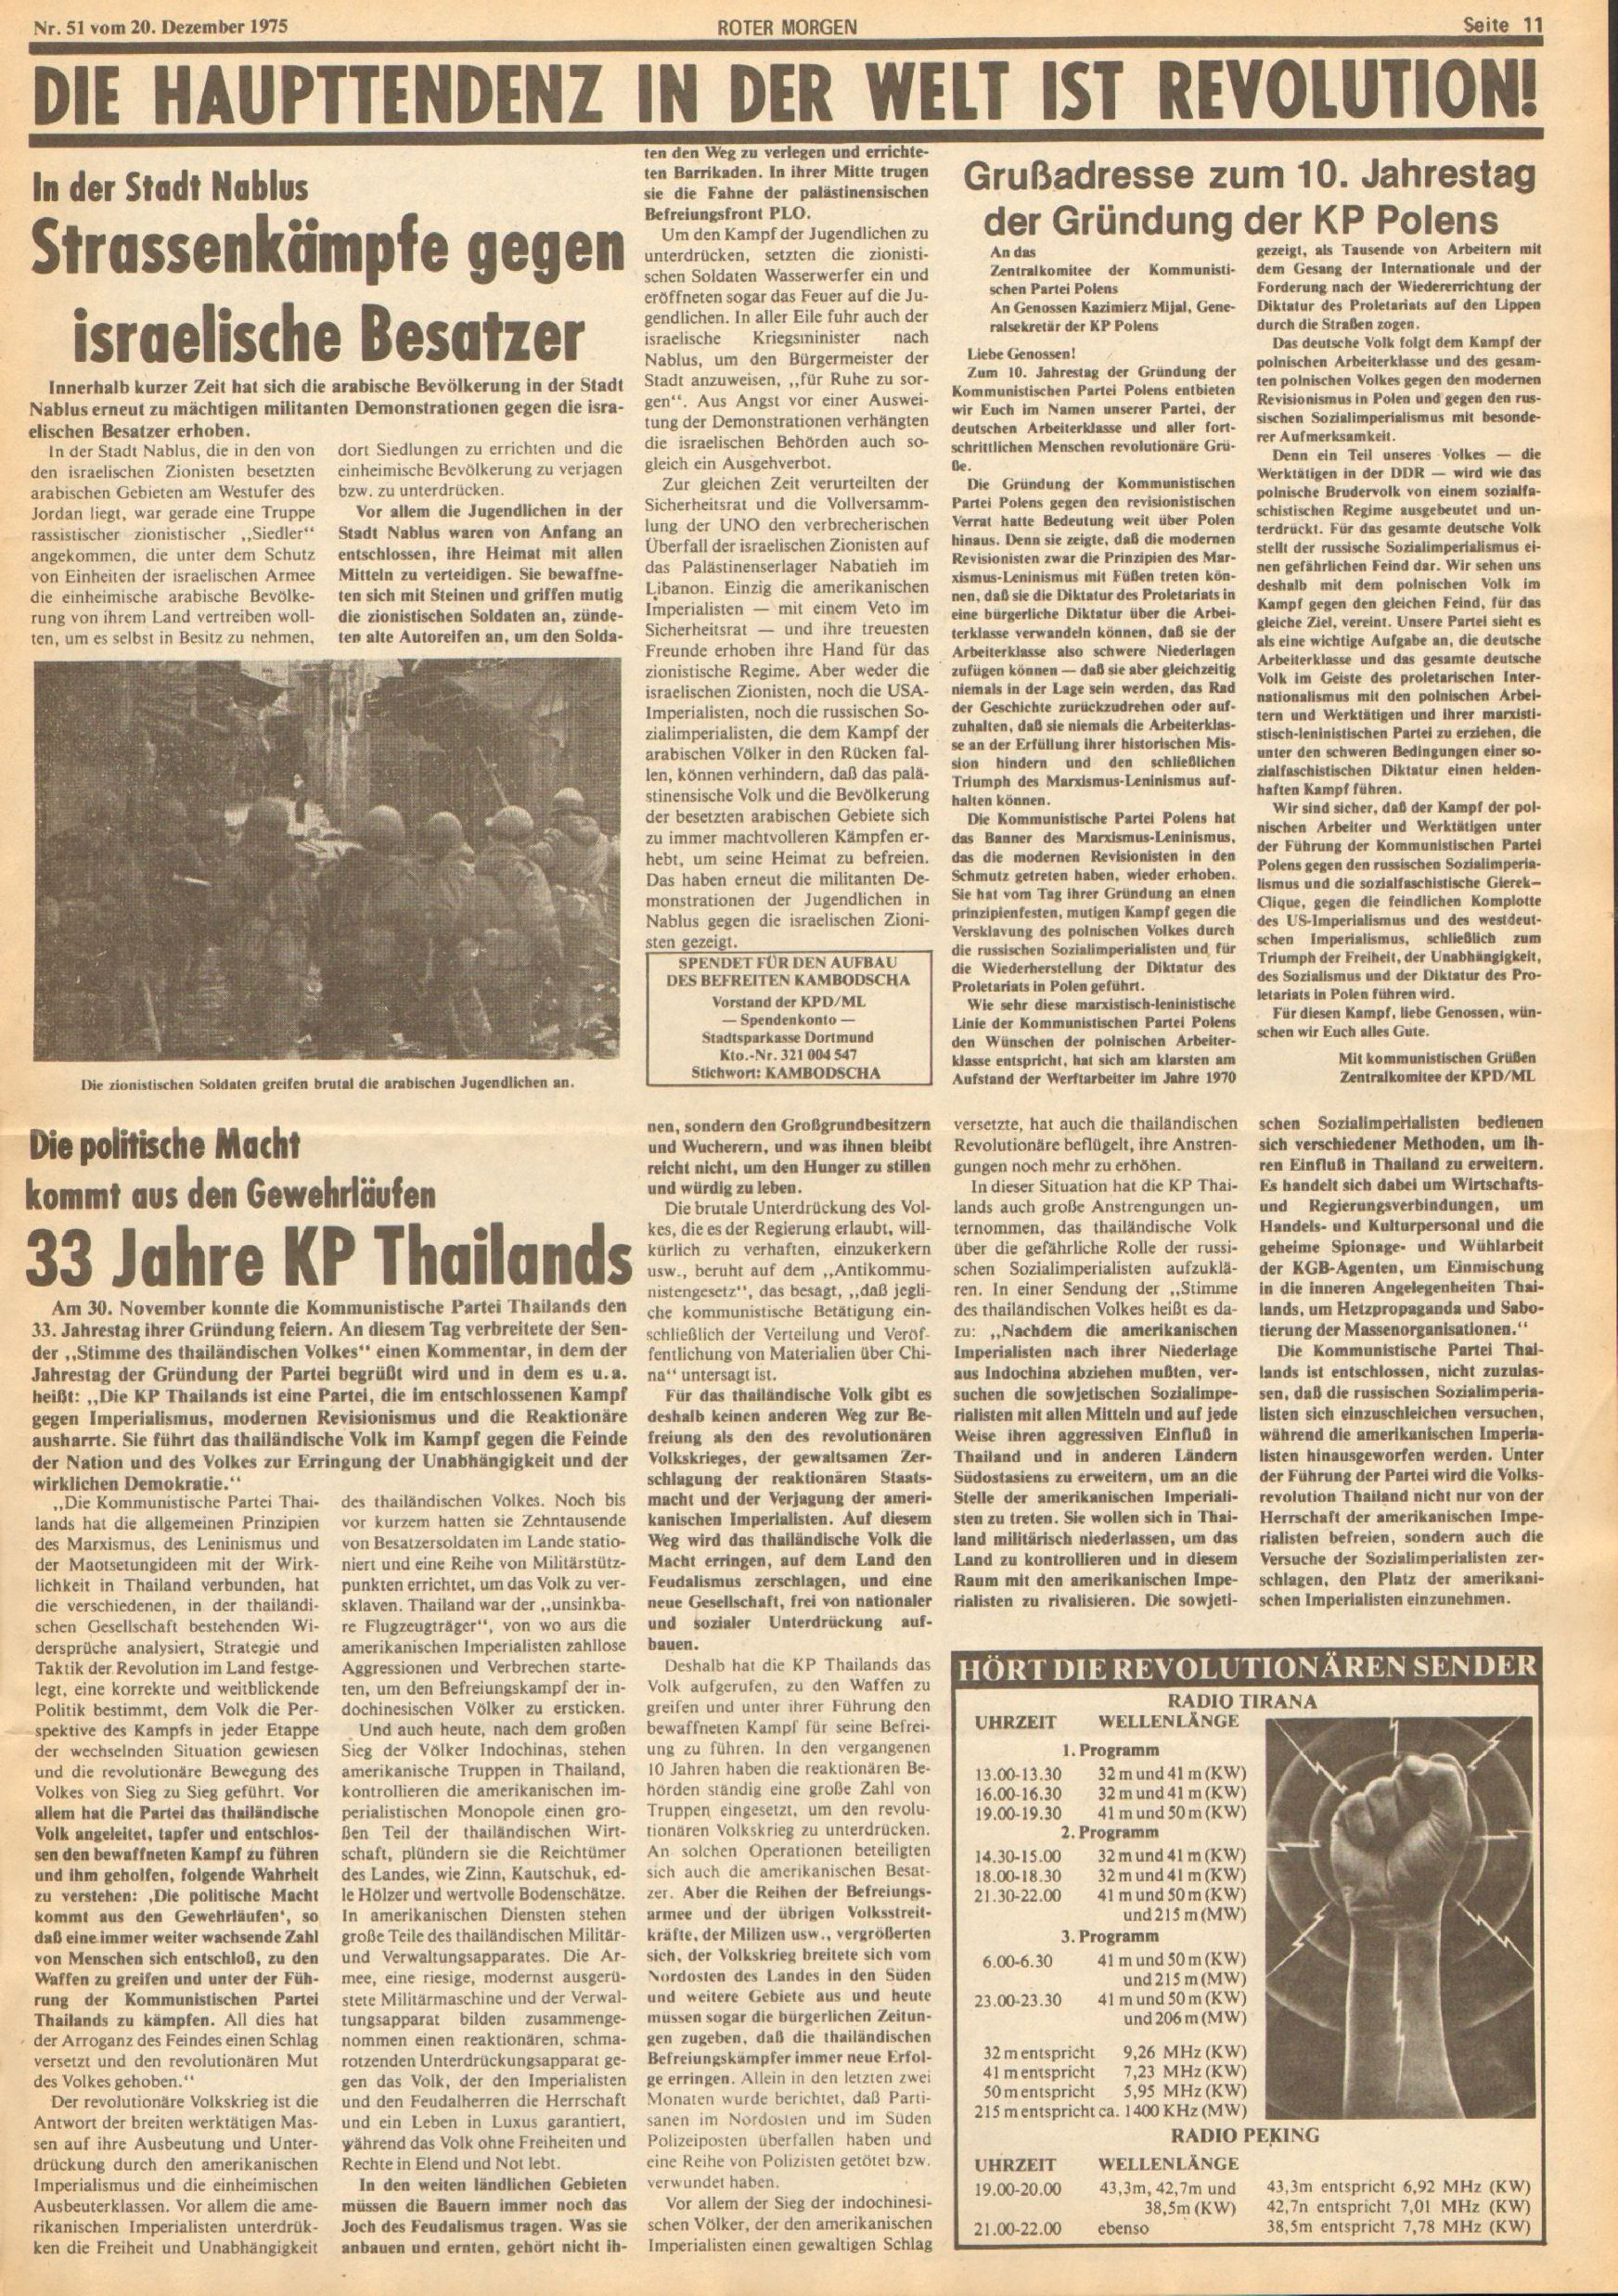 Roter Morgen, 9. Jg., 20. Dezember 1975, Nr. 51, Seite 11